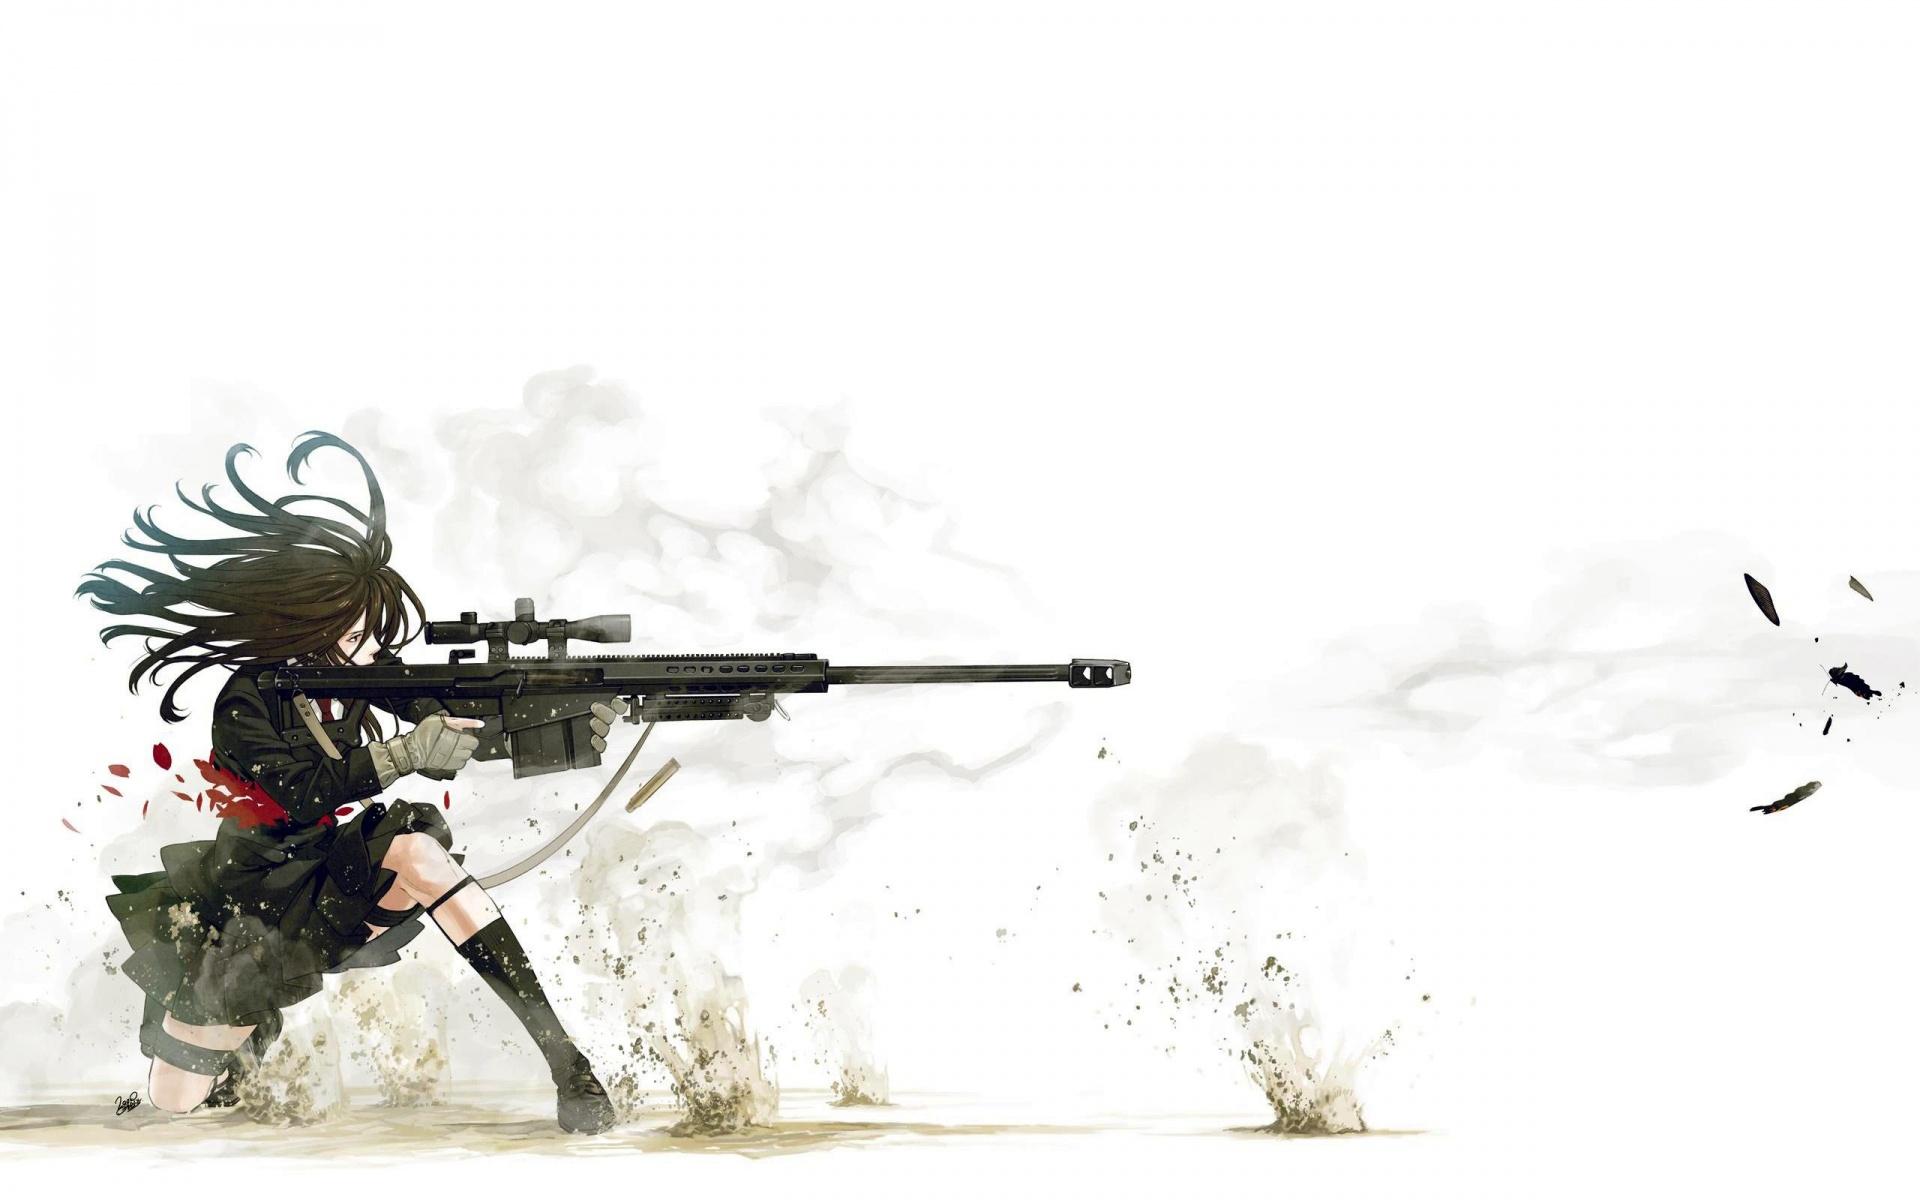 anime sniper wallpaper wallpapers 1920x1200 1920x1200